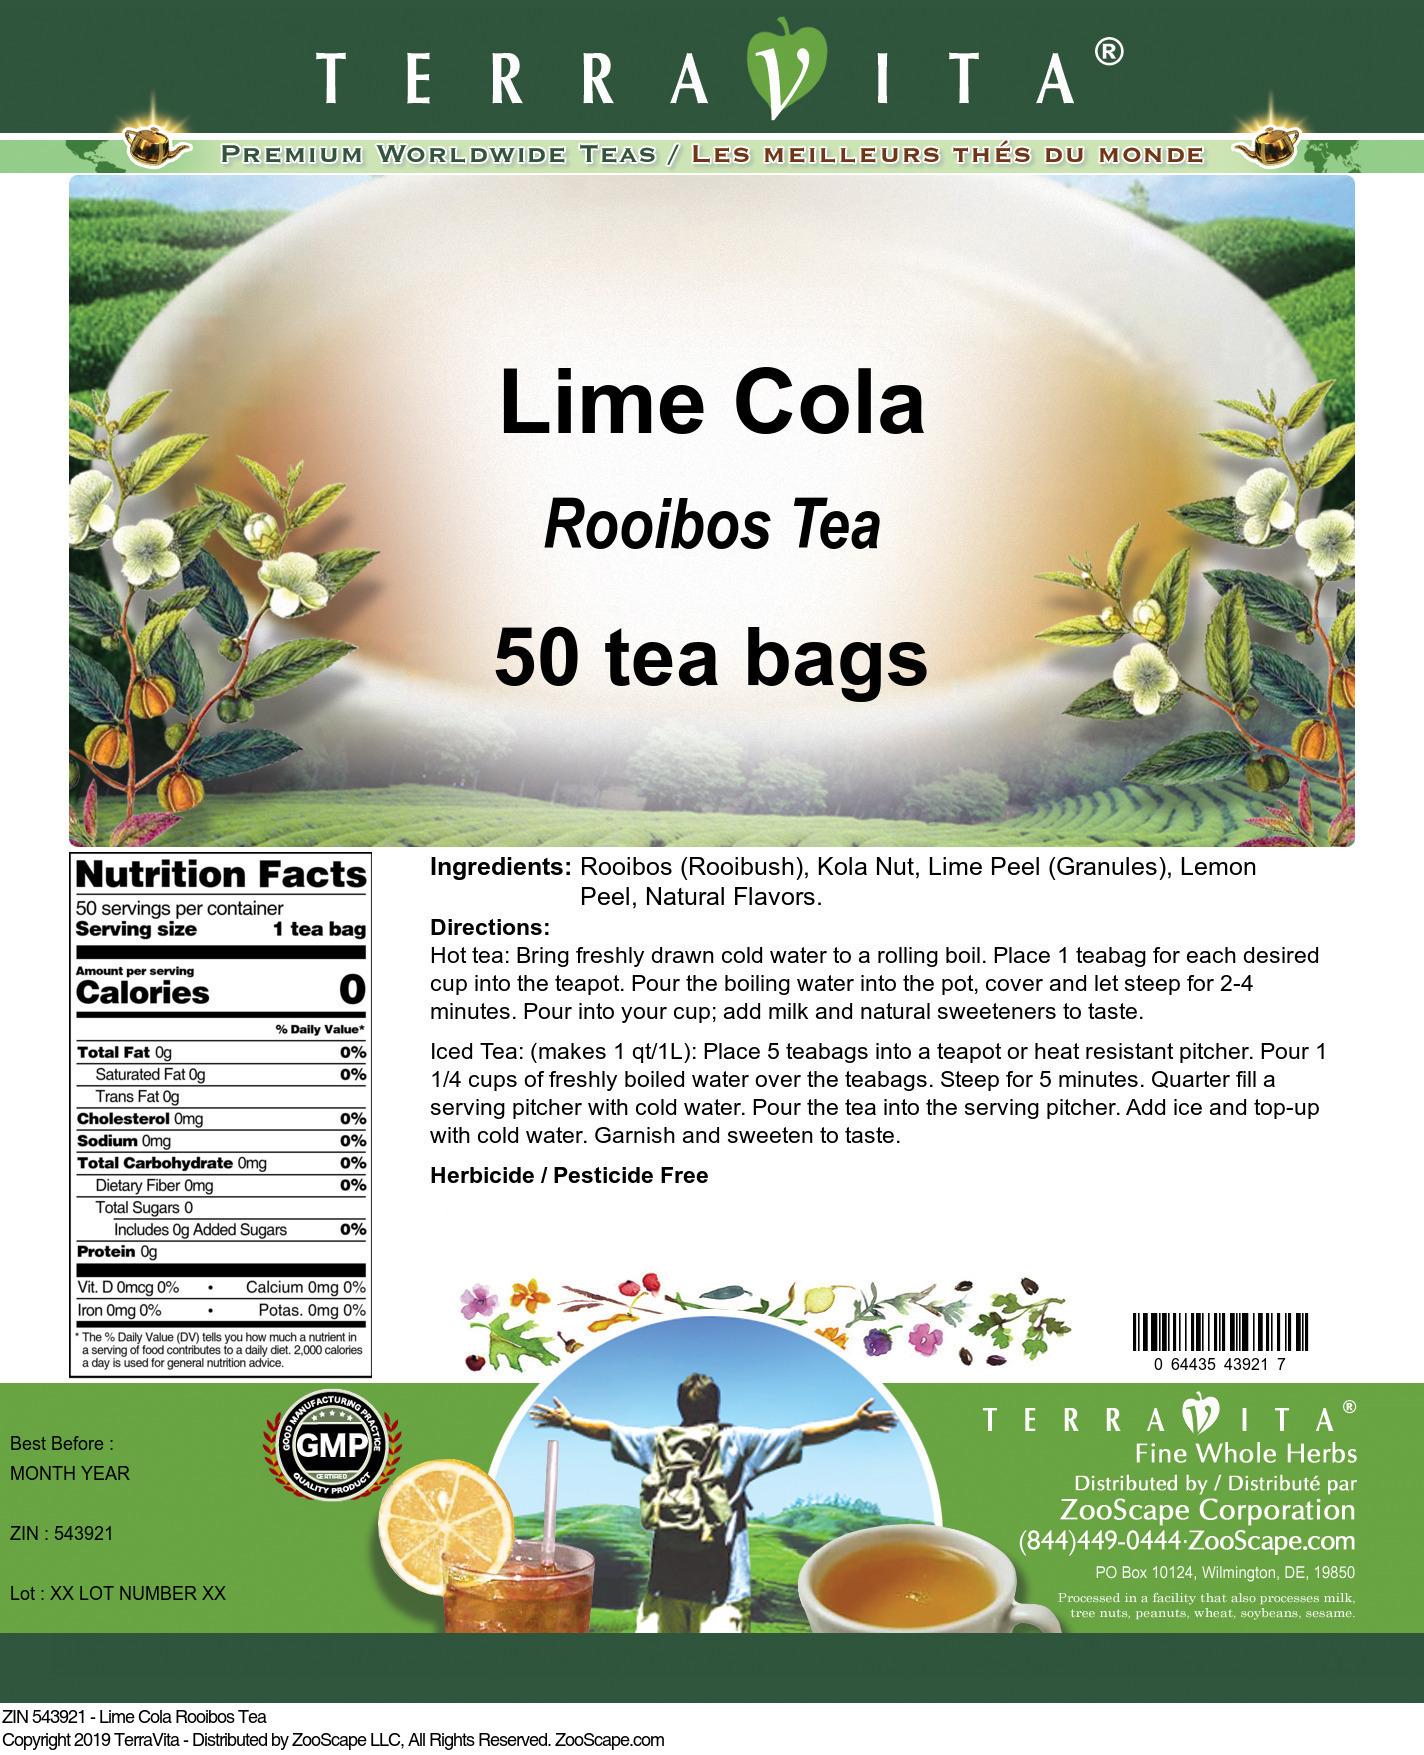 Lime Cola Rooibos Tea